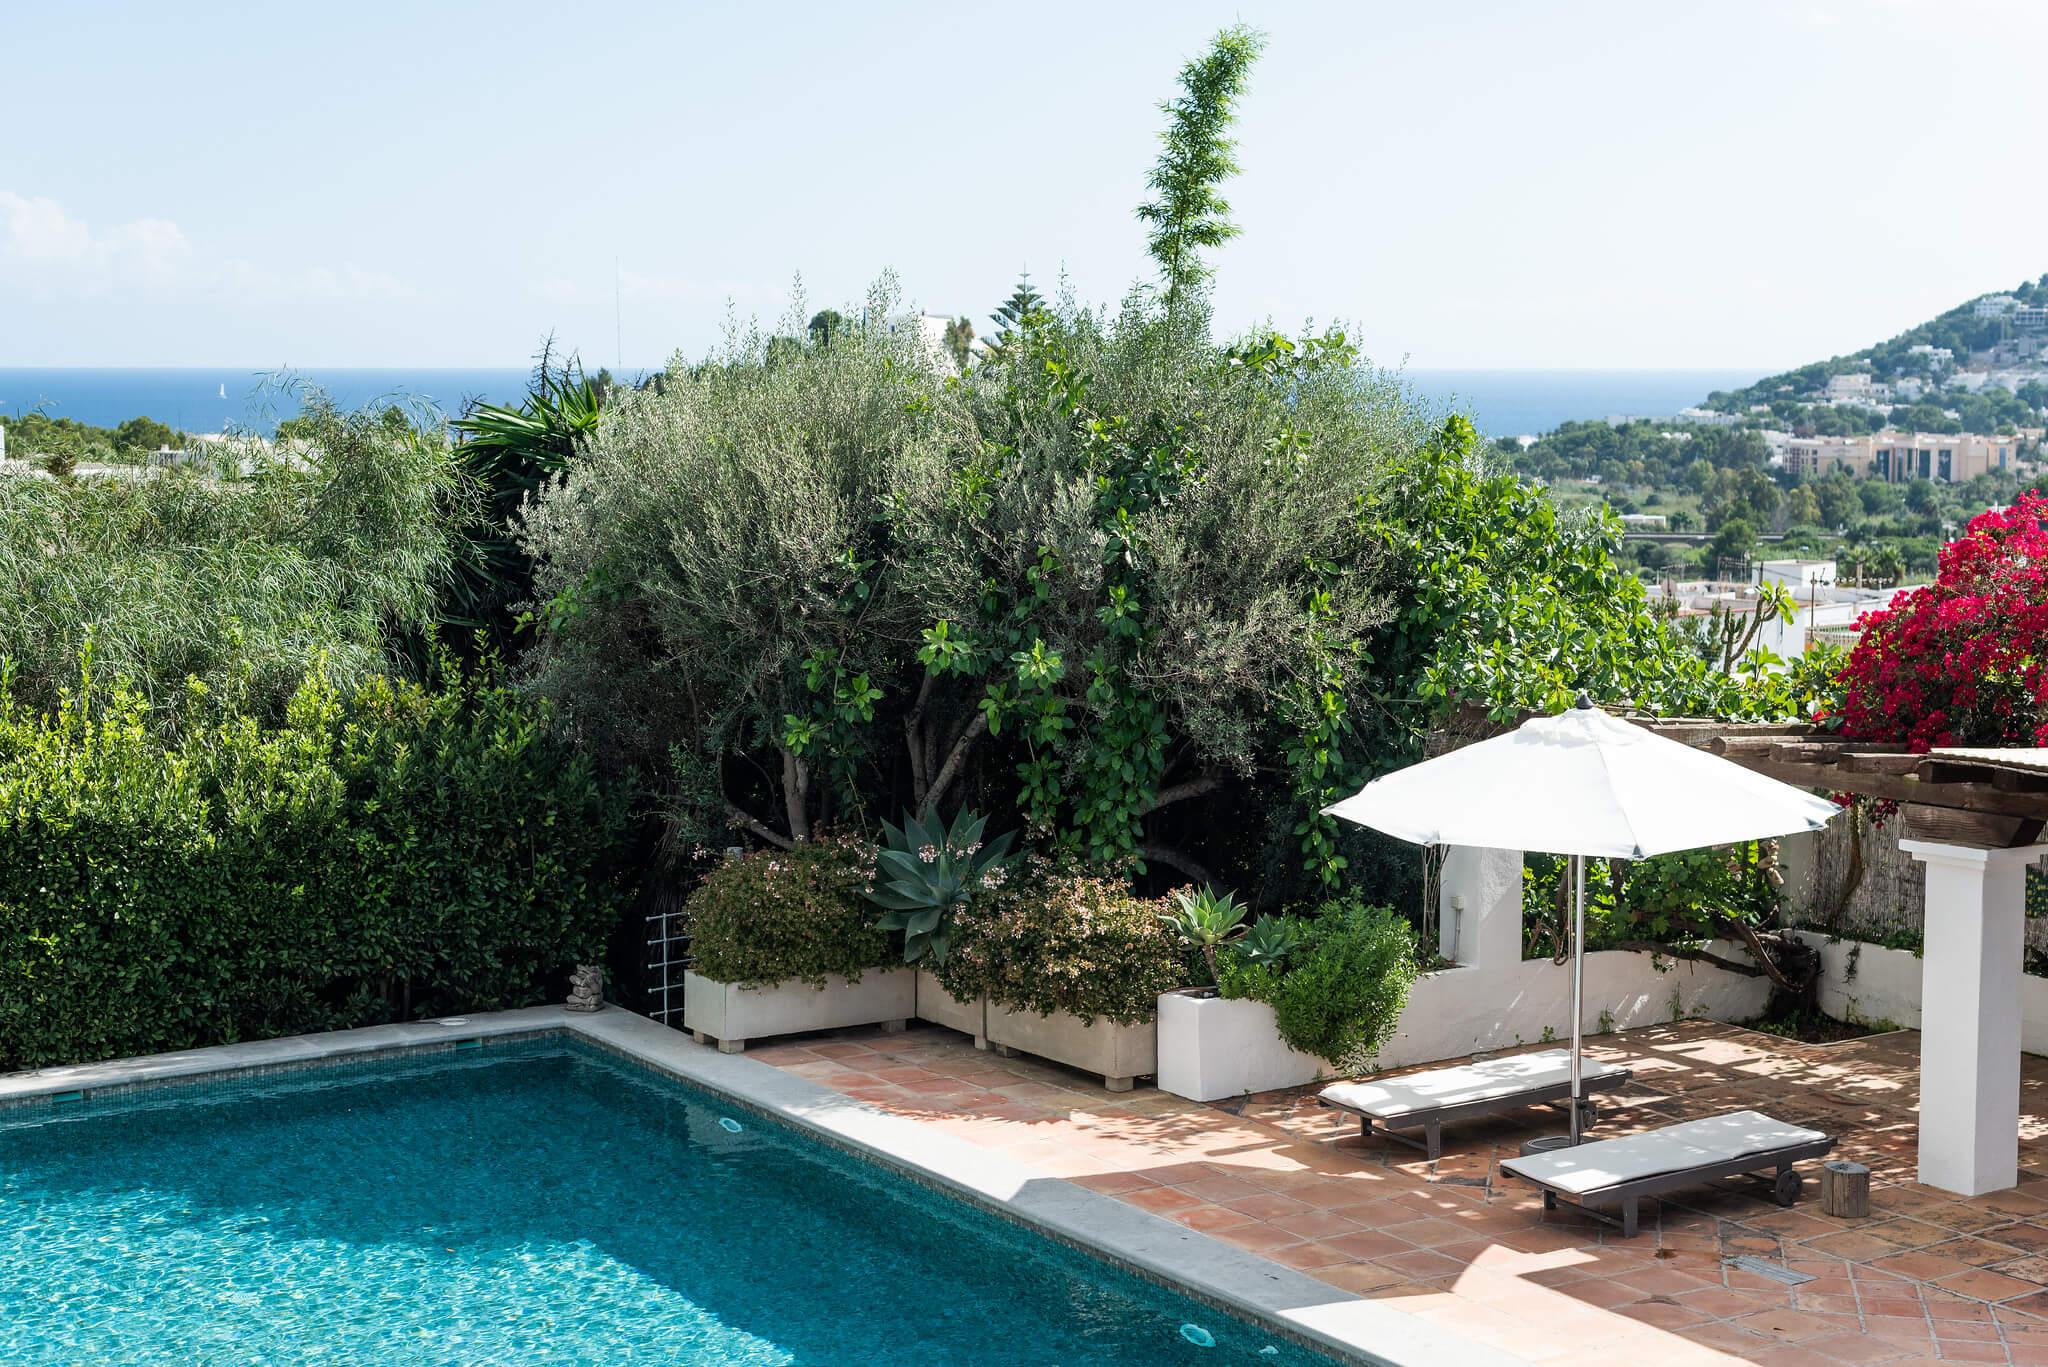 https://www.white-ibiza.com/wp-content/uploads/2020/05/white-ibiza-villas-can-lyra-exterior-views.jpg